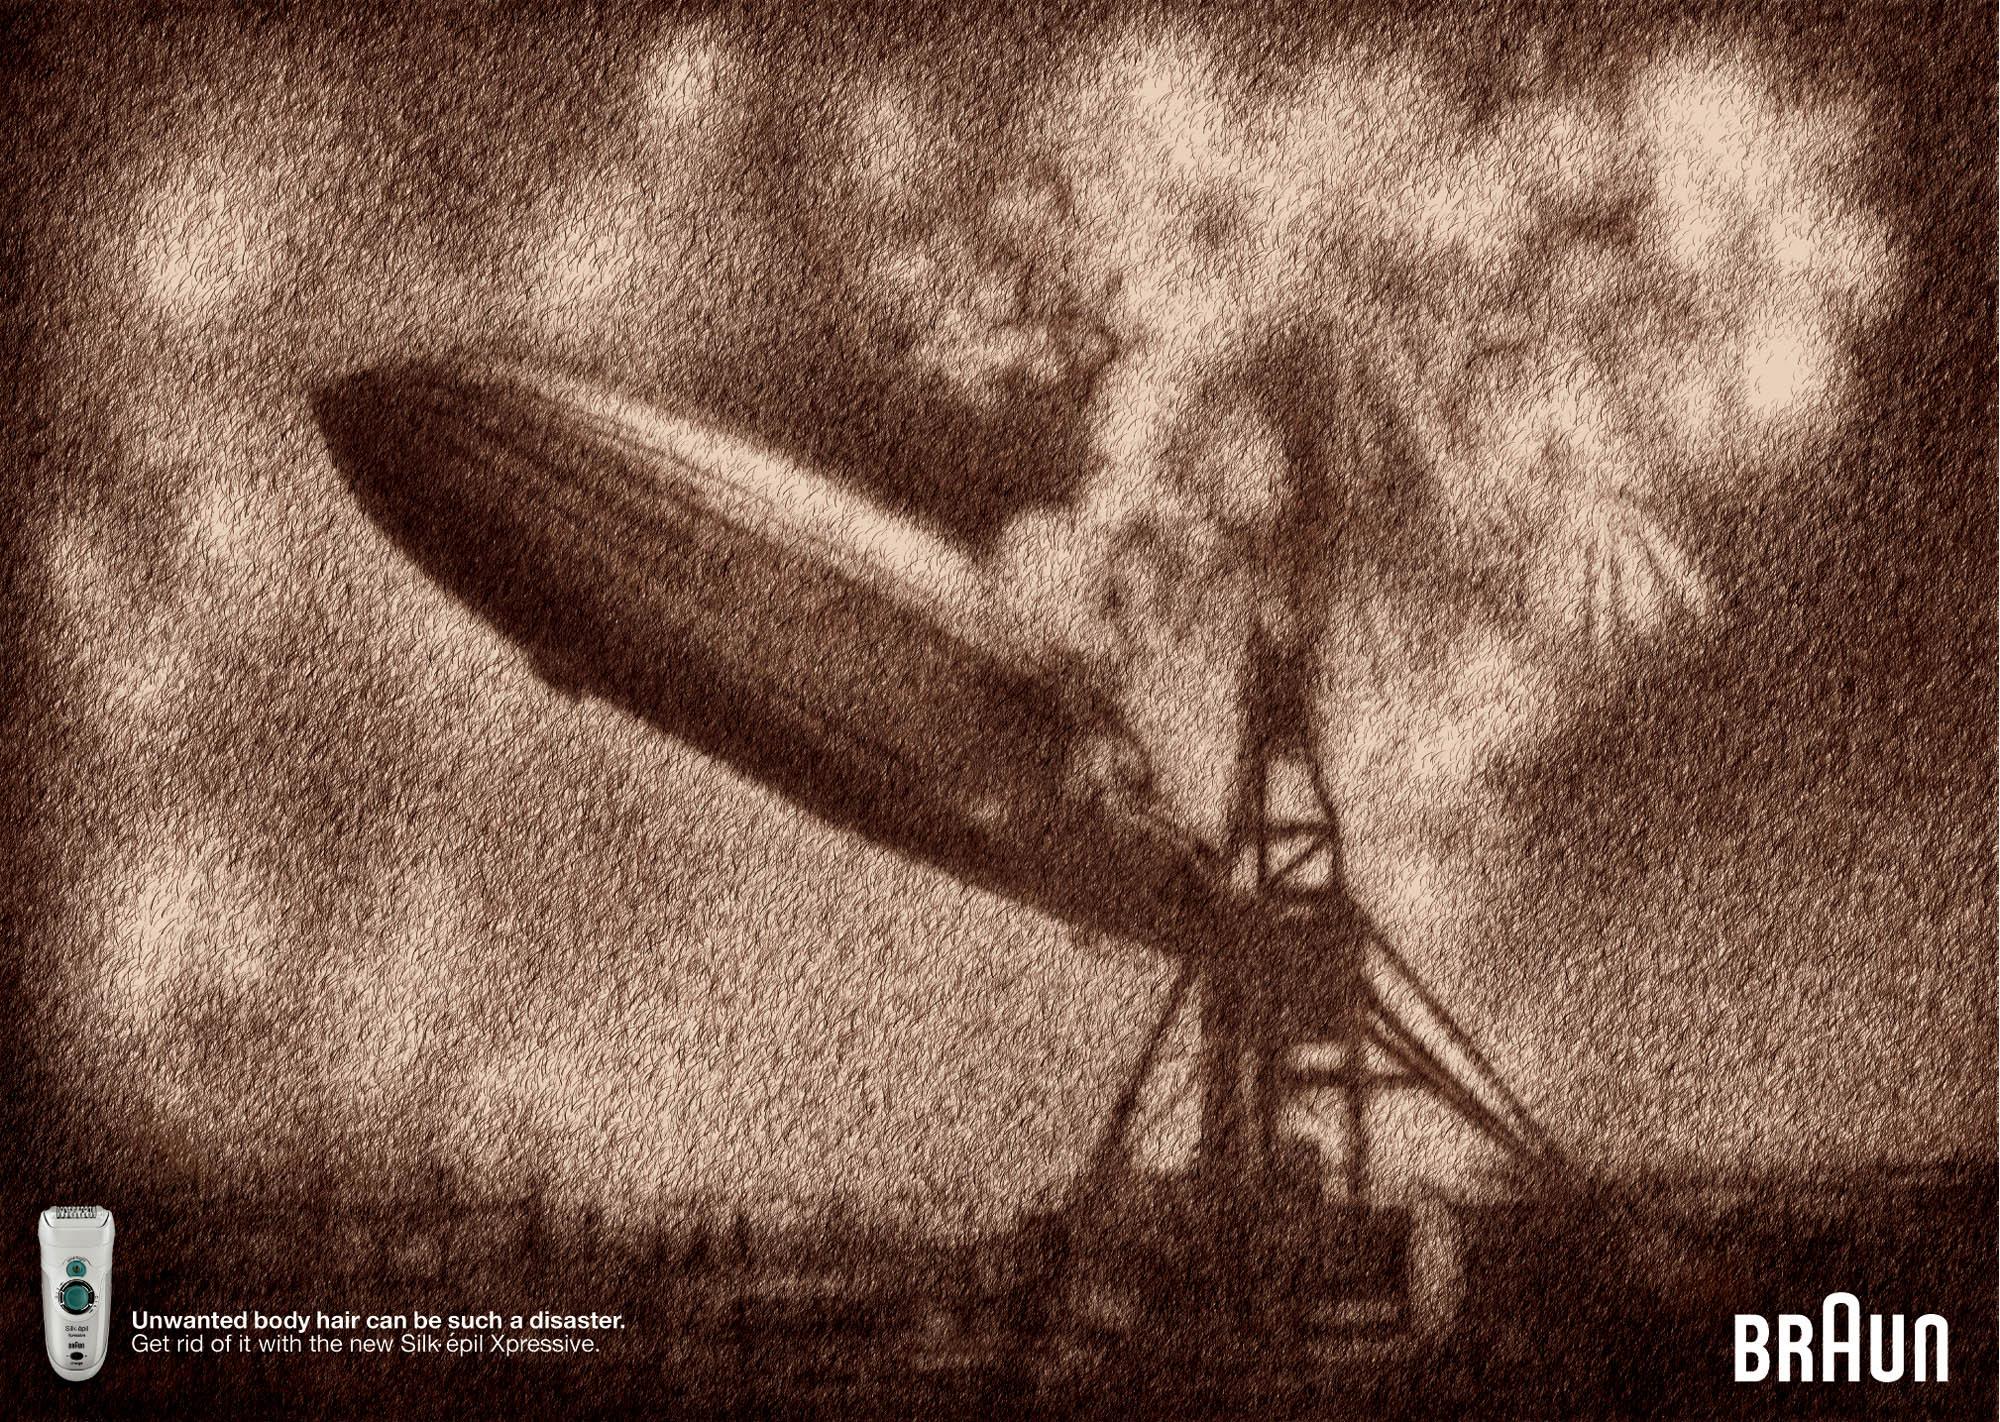 https://i0.wp.com/www.ibelieveinadv.com/wp-content/uploads/2011/07/Braun-Hindenburg-Crash.jpg